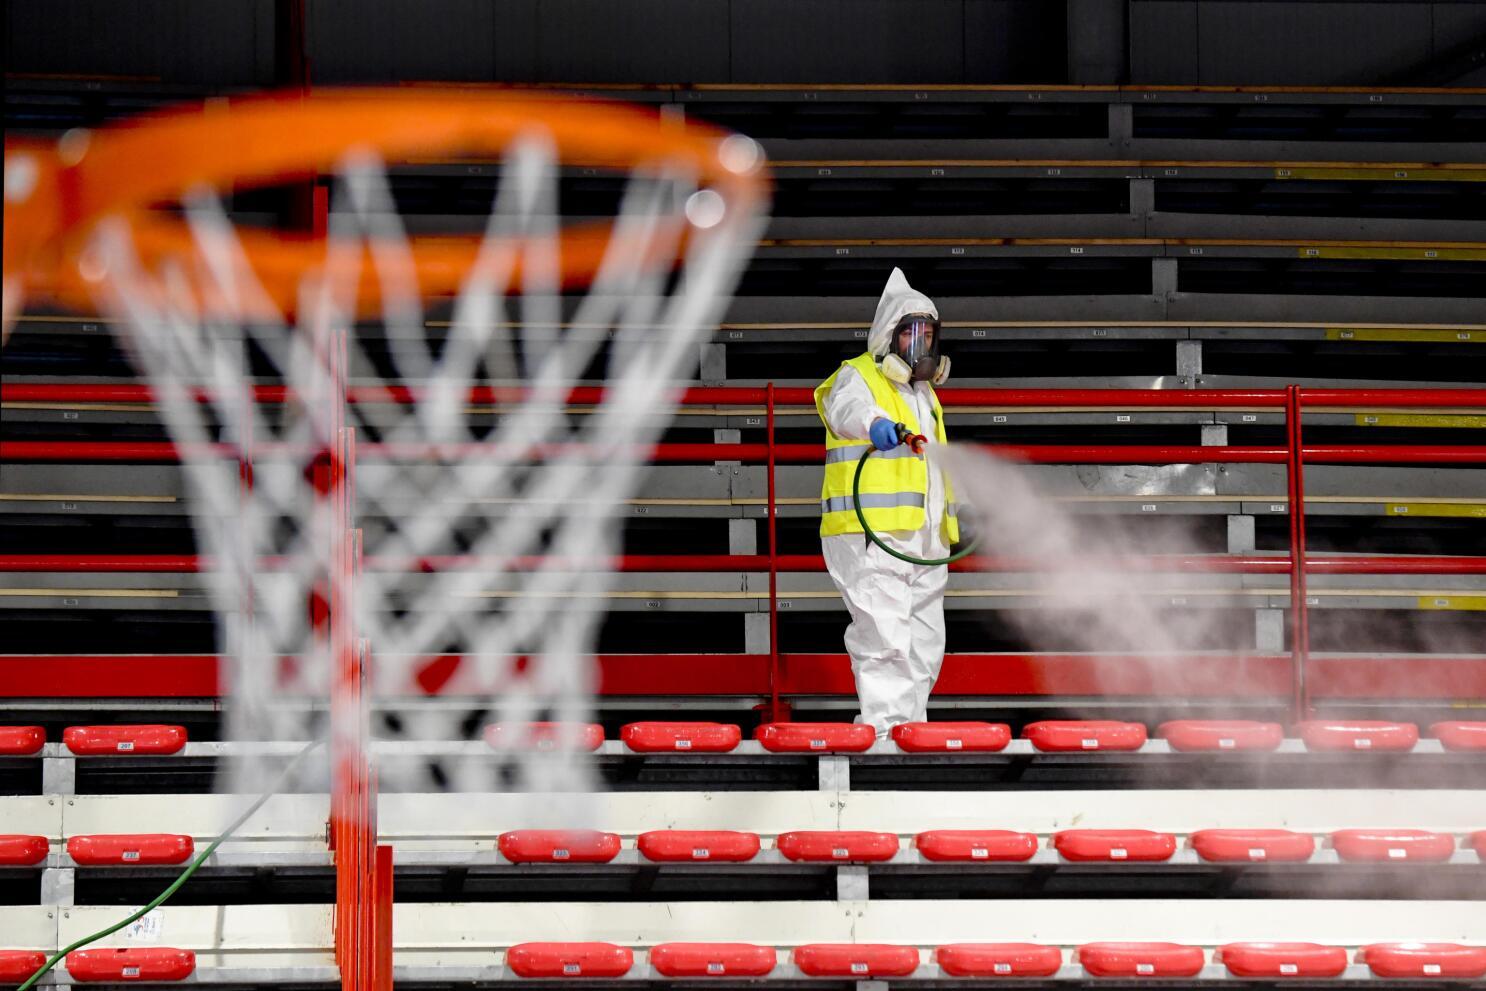 Sports teams brace for coronavirus outbreak - Los Angeles Times